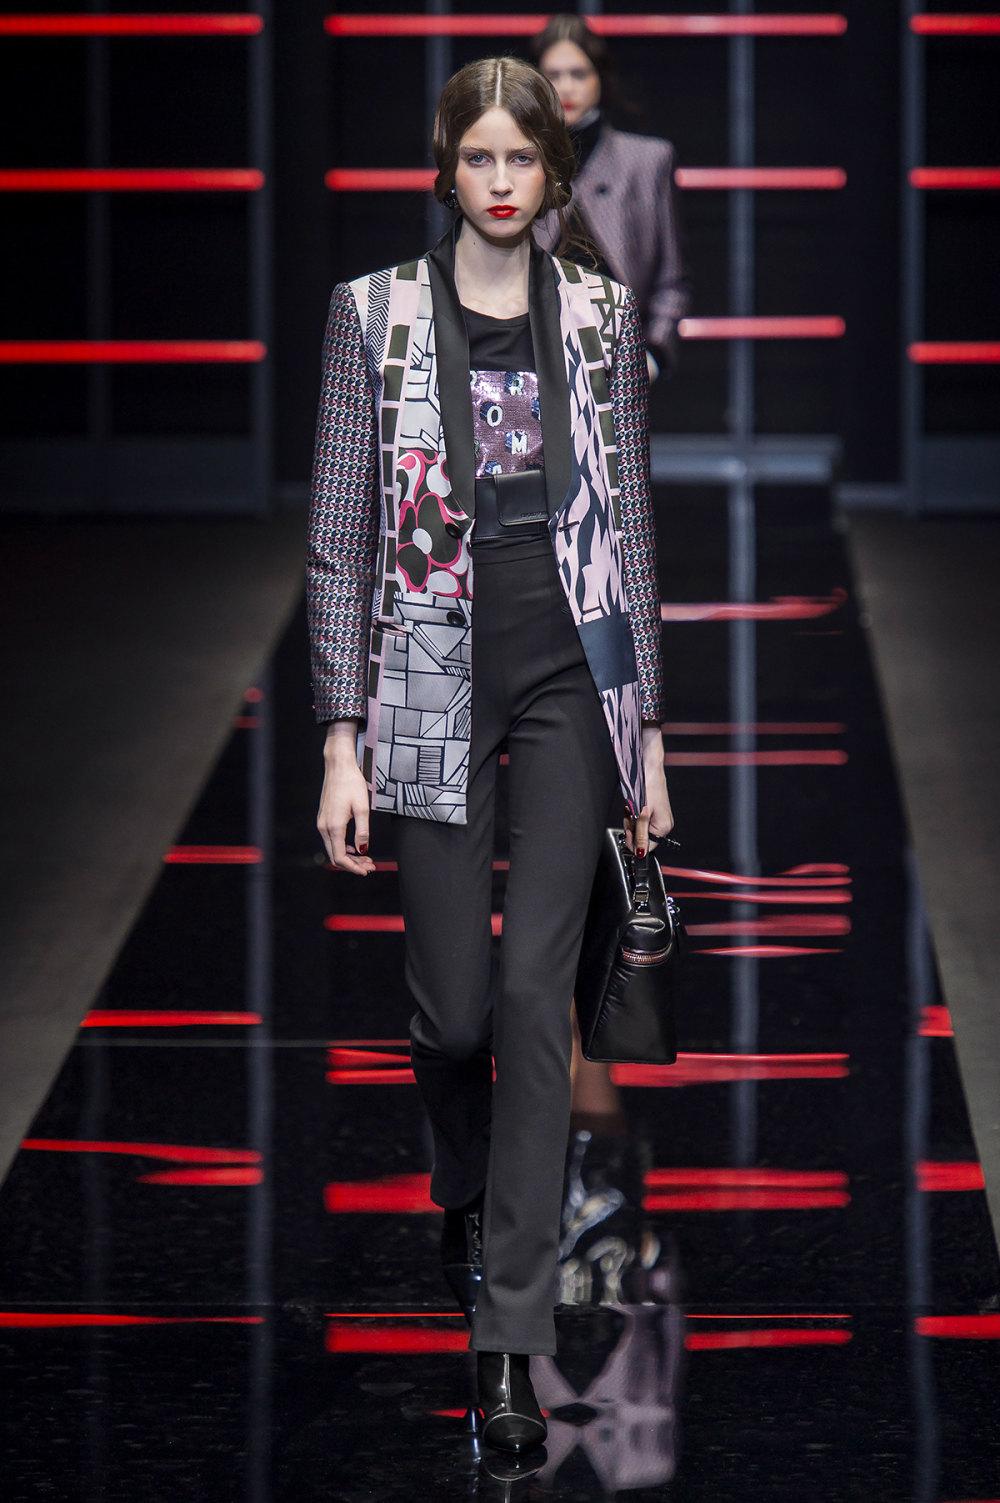 Emporio Armani时装系列畅的裤子带有柔滑裙子的鸡尾酒礼服-39.jpg